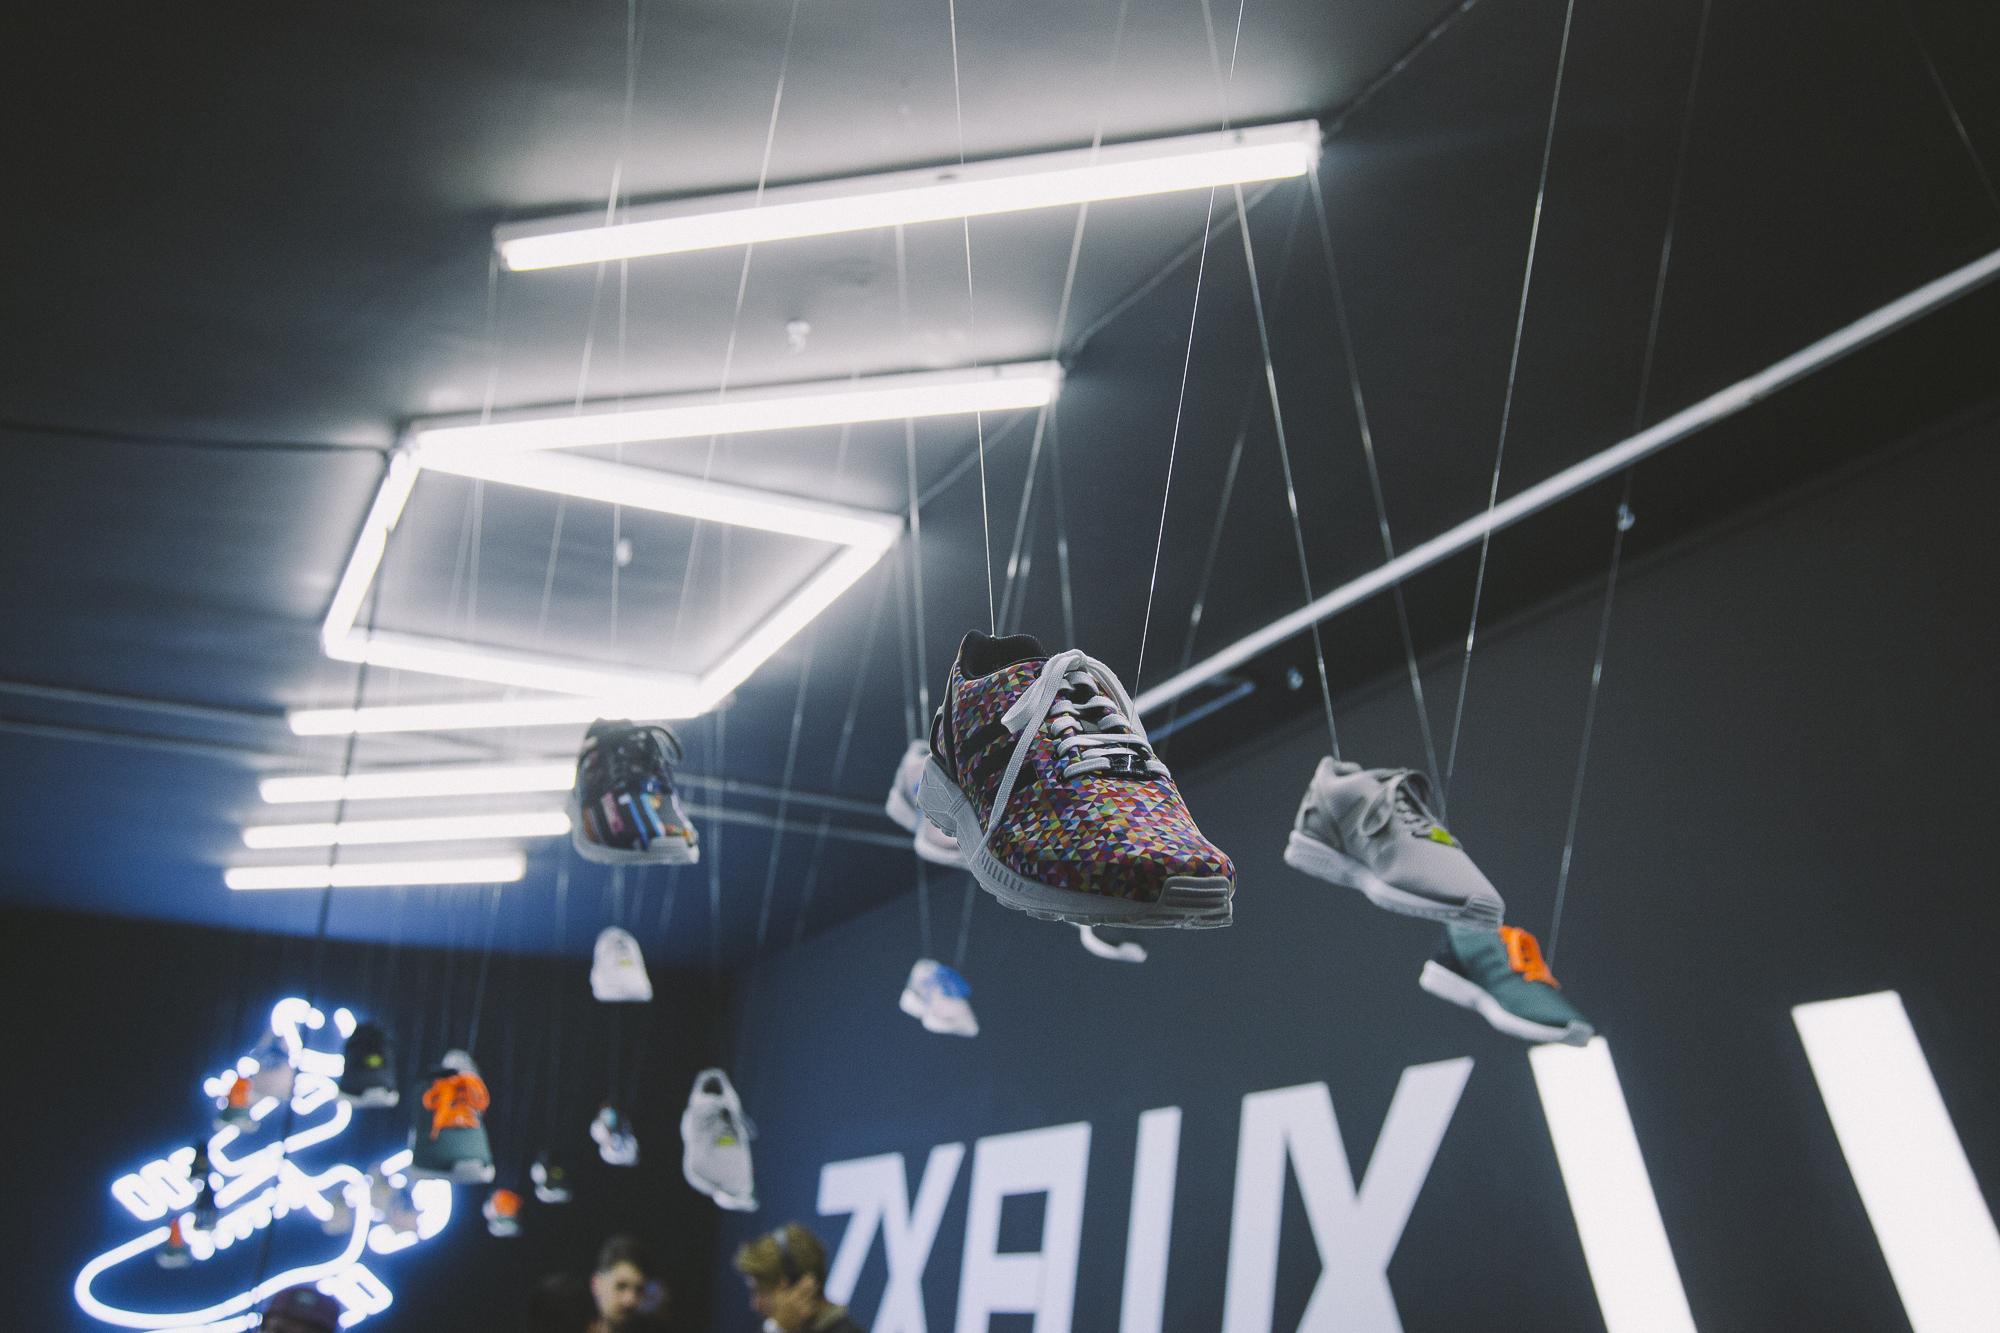 08_Adidas_ZX Flux_KimTerriSmith.jpg